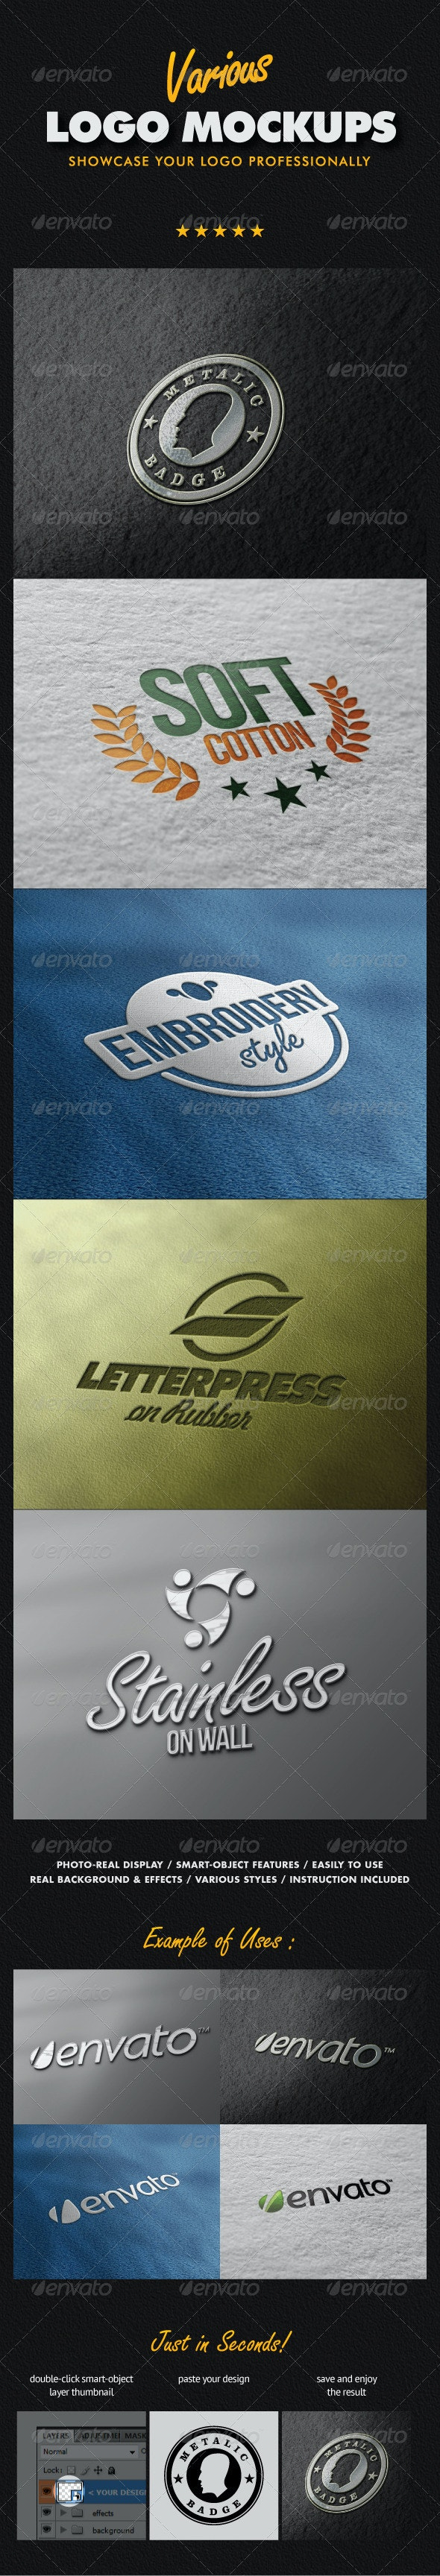 Various Logo Mock-ups - Logo Product Mock-Ups